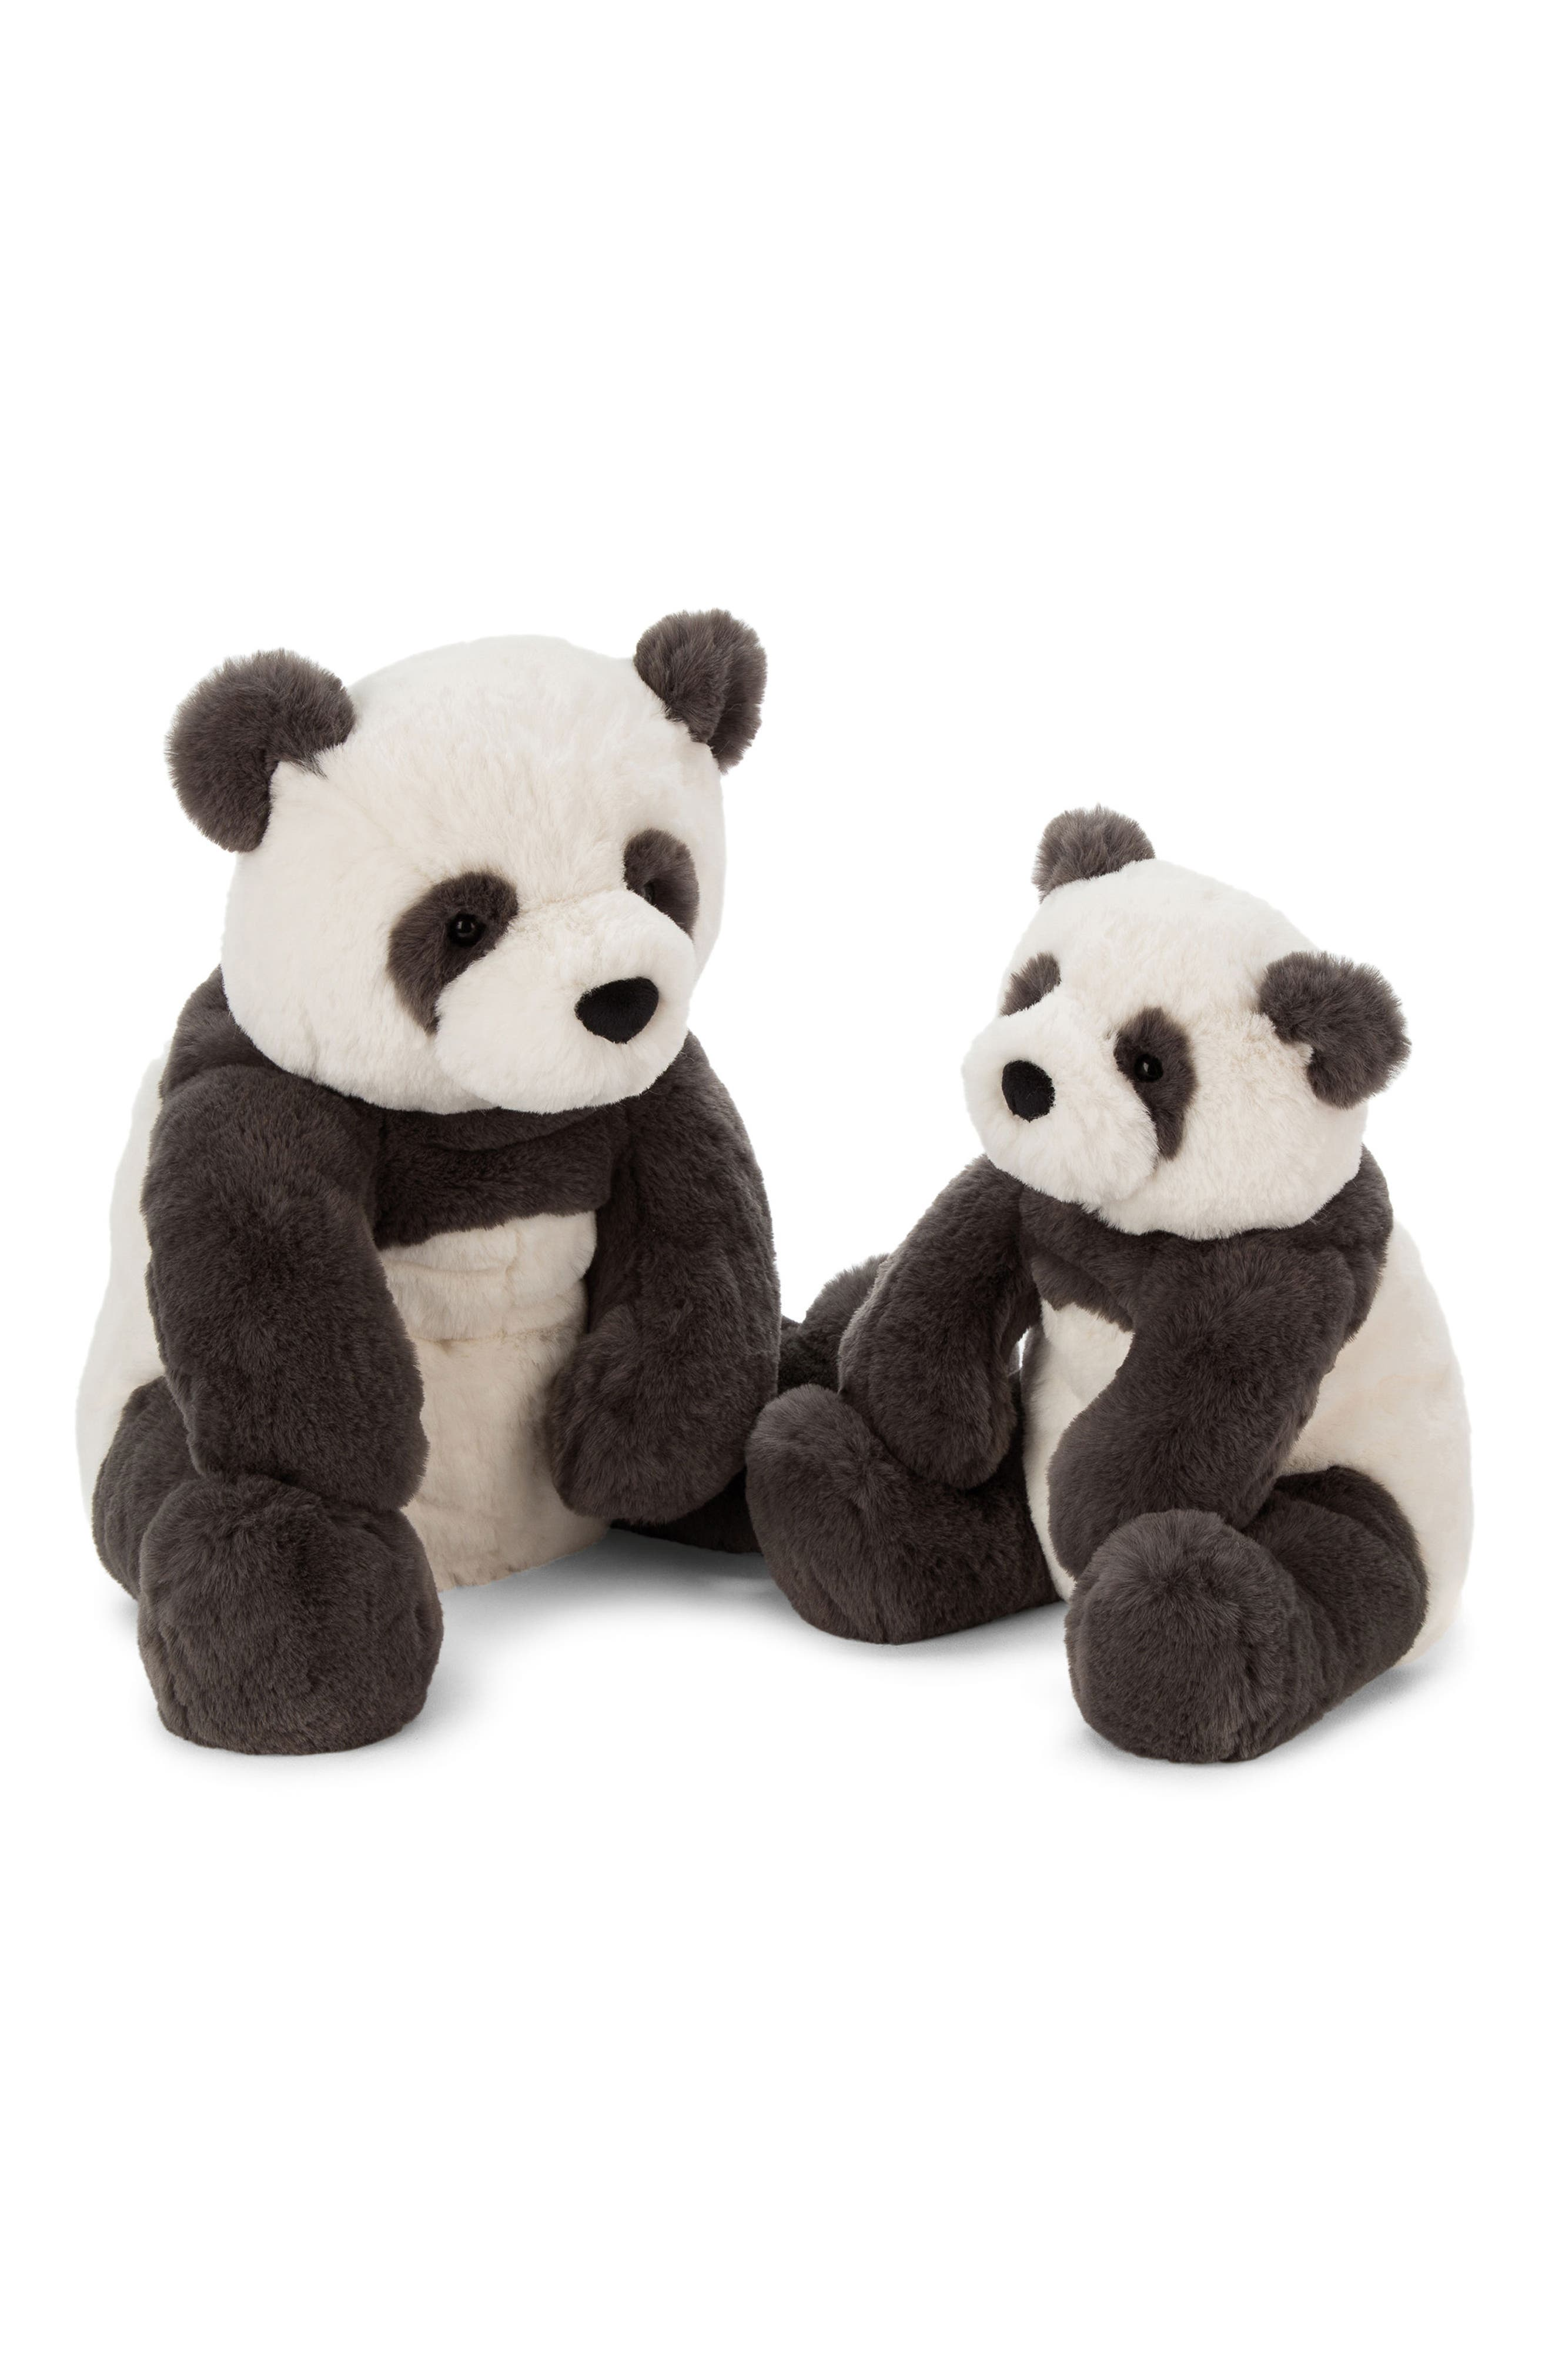 Little Harry Panda Stuffed Animal,                             Alternate thumbnail 2, color,                             BLACK / CREAM